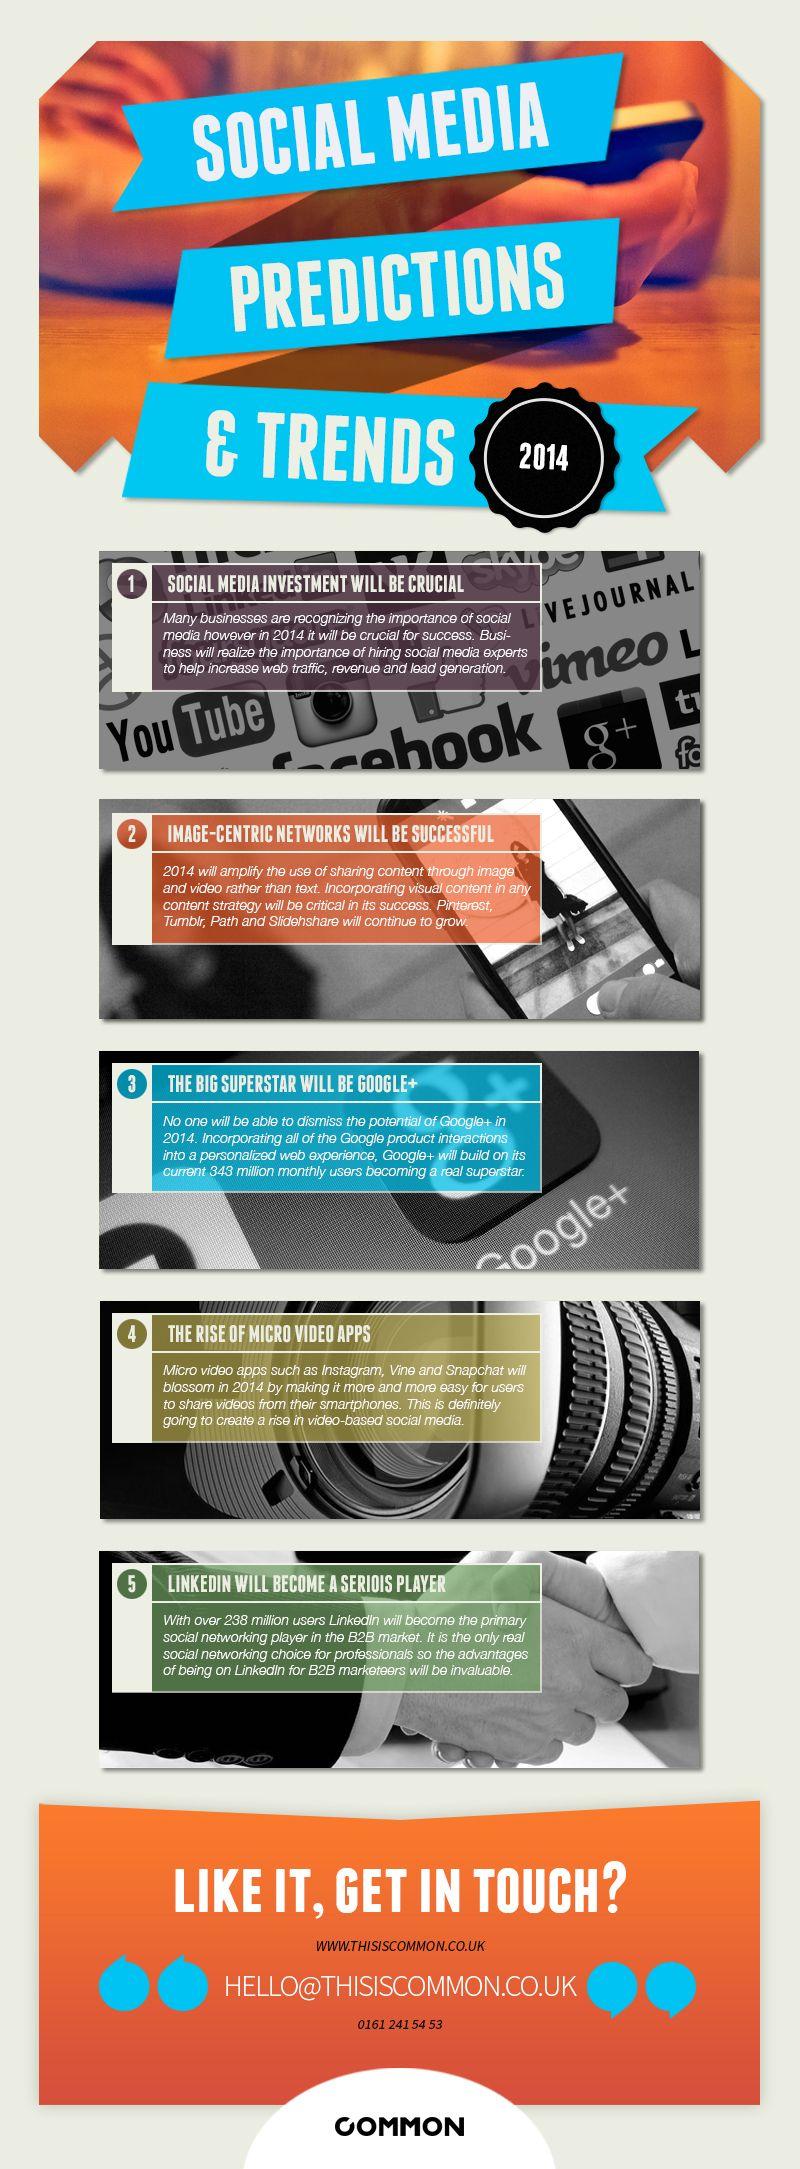 Social Media Marketing Trends And Predictions 2014 - # ...